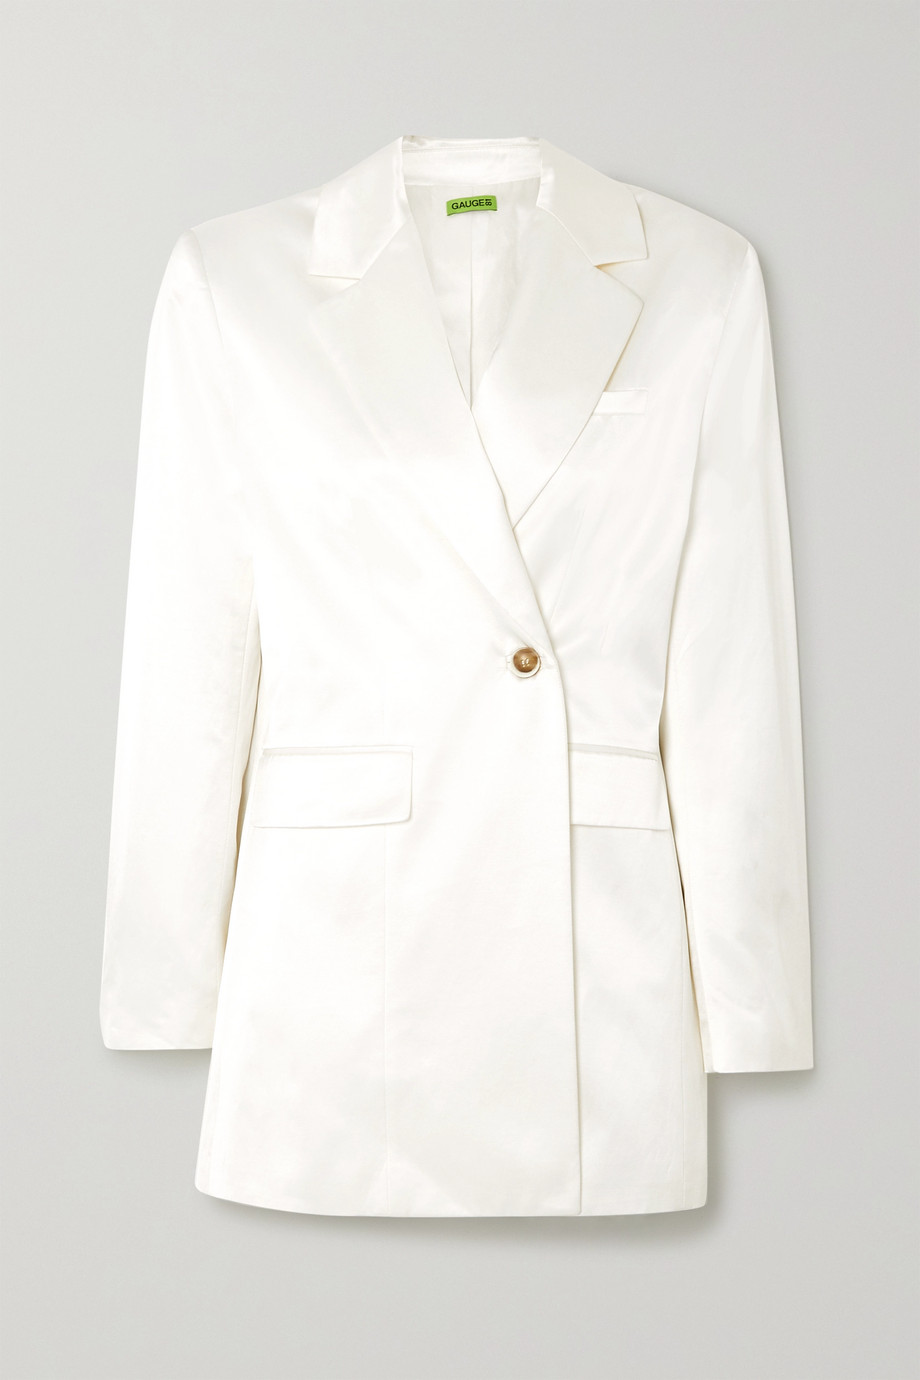 GAUGE81 Seattle 棉质混纺西装外套